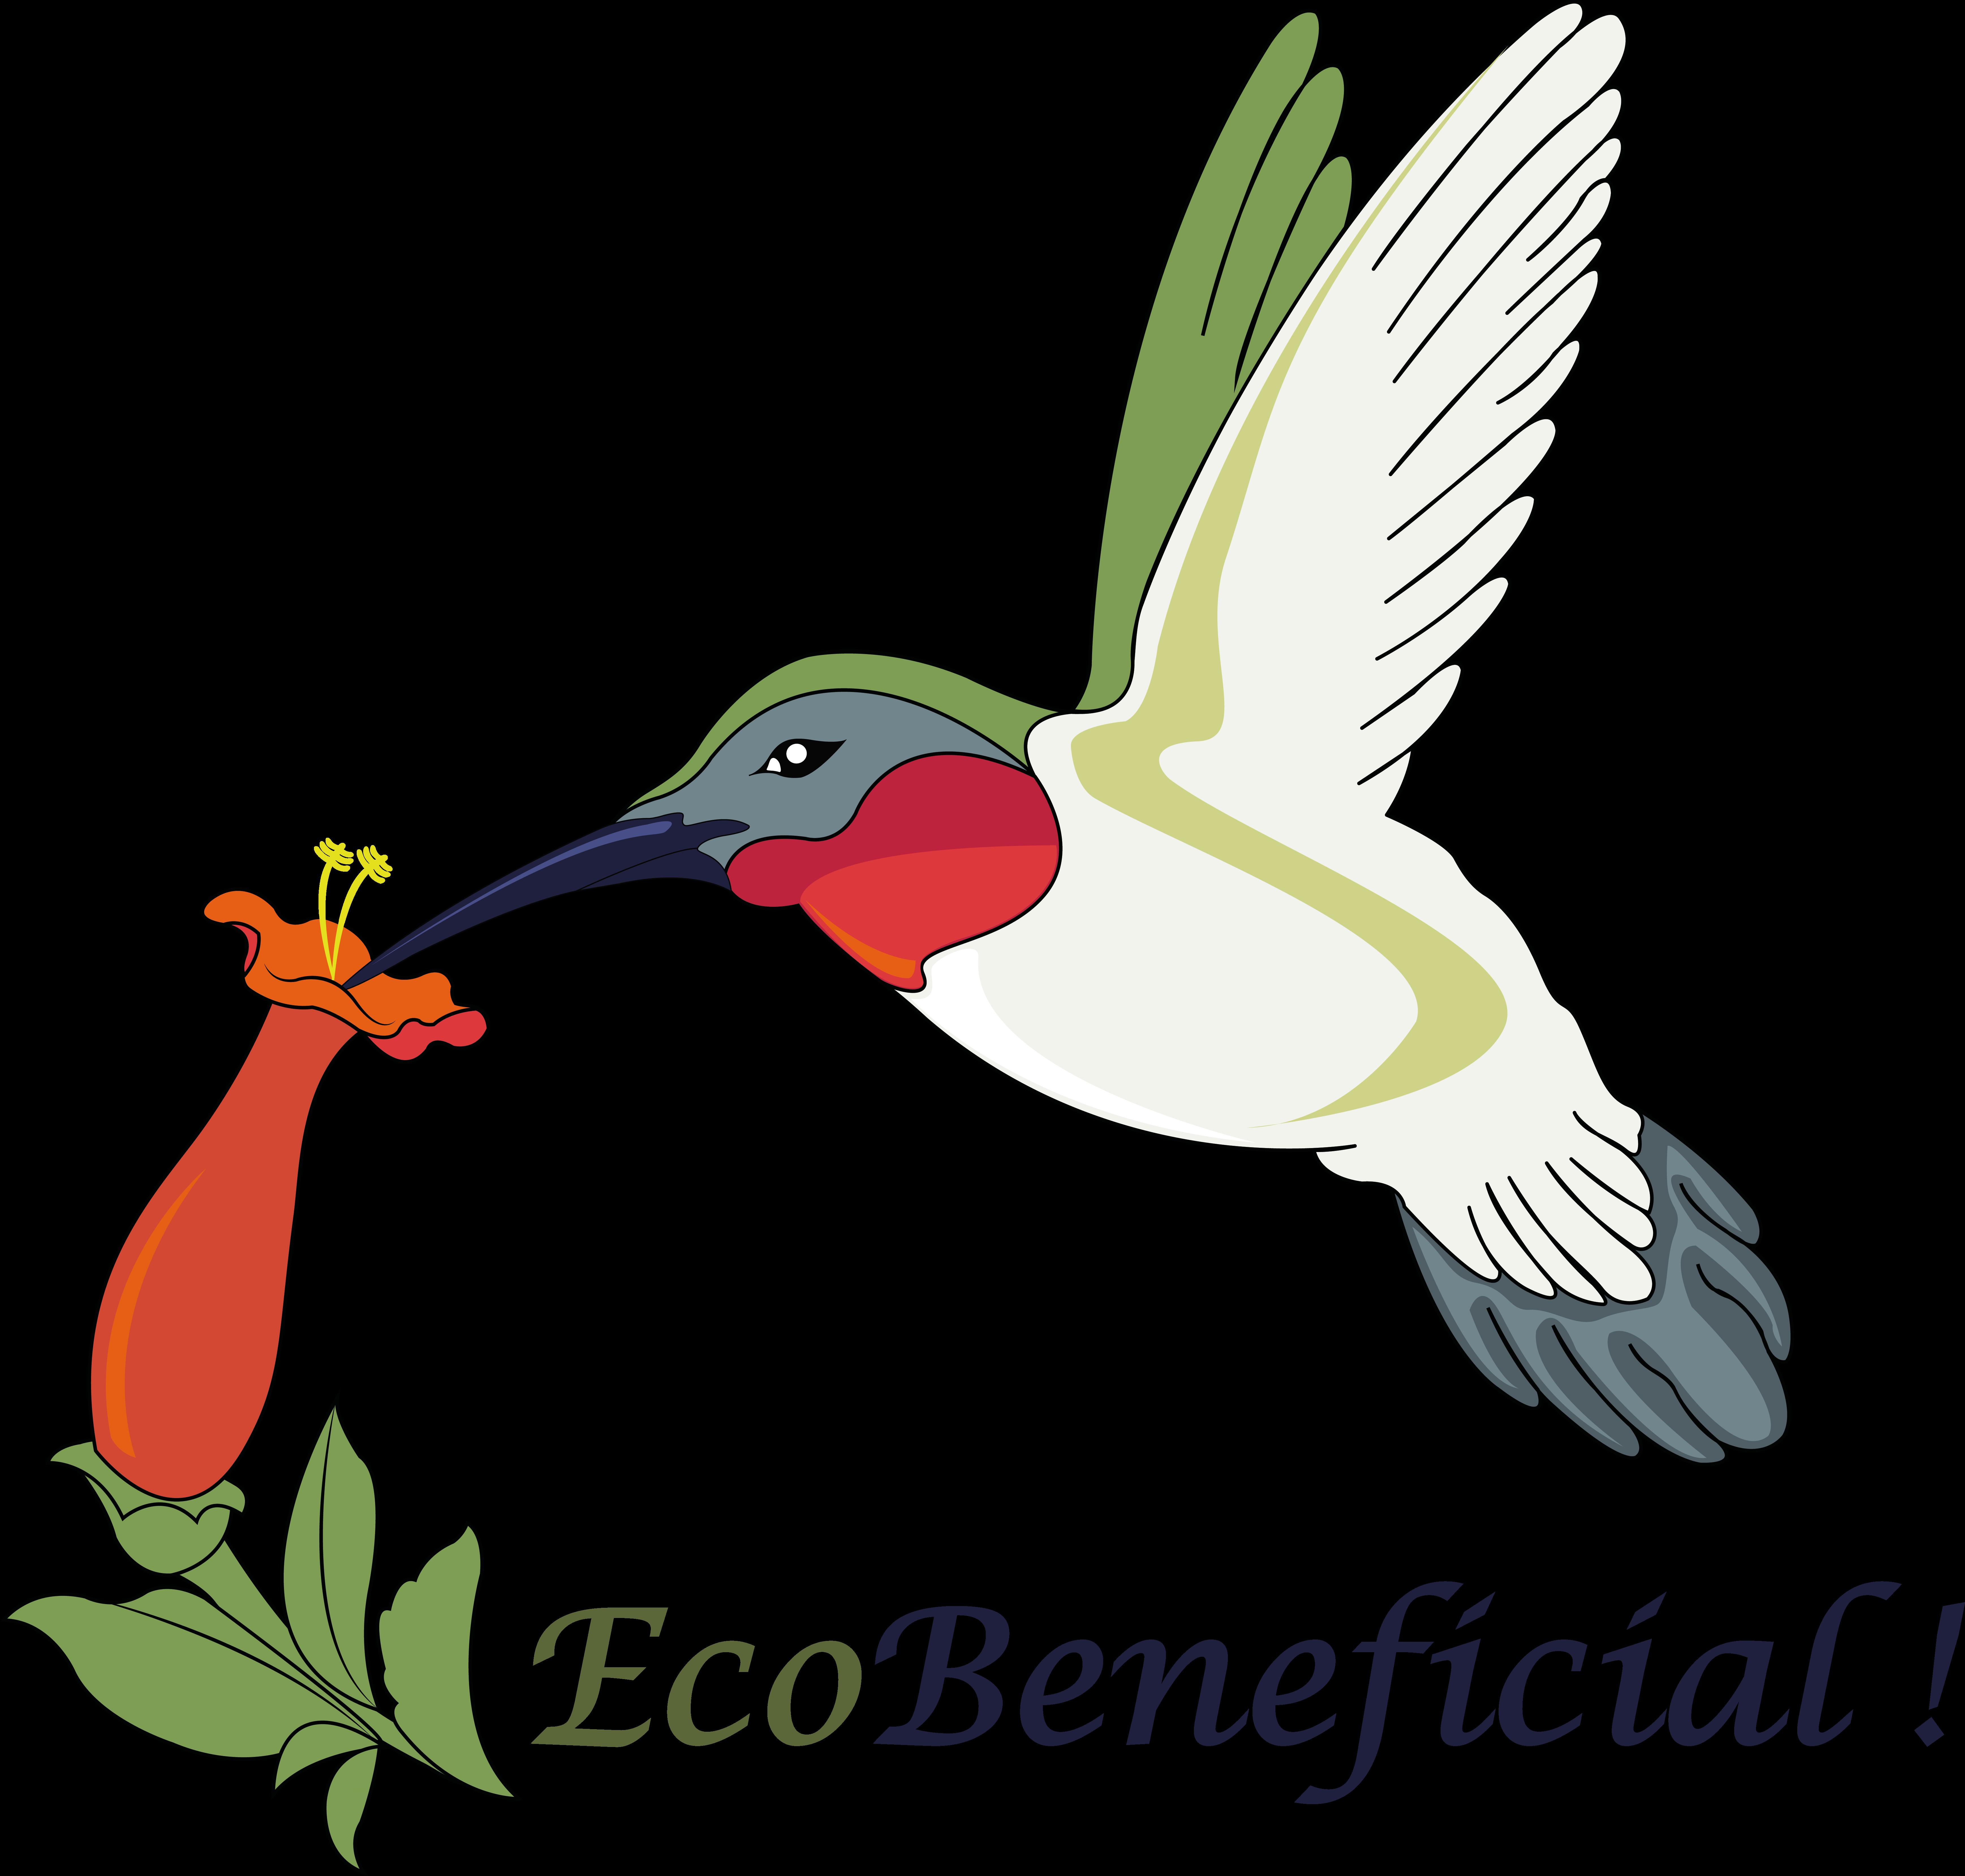 Plants clipart native plant. Press kit ecobeneficial logo